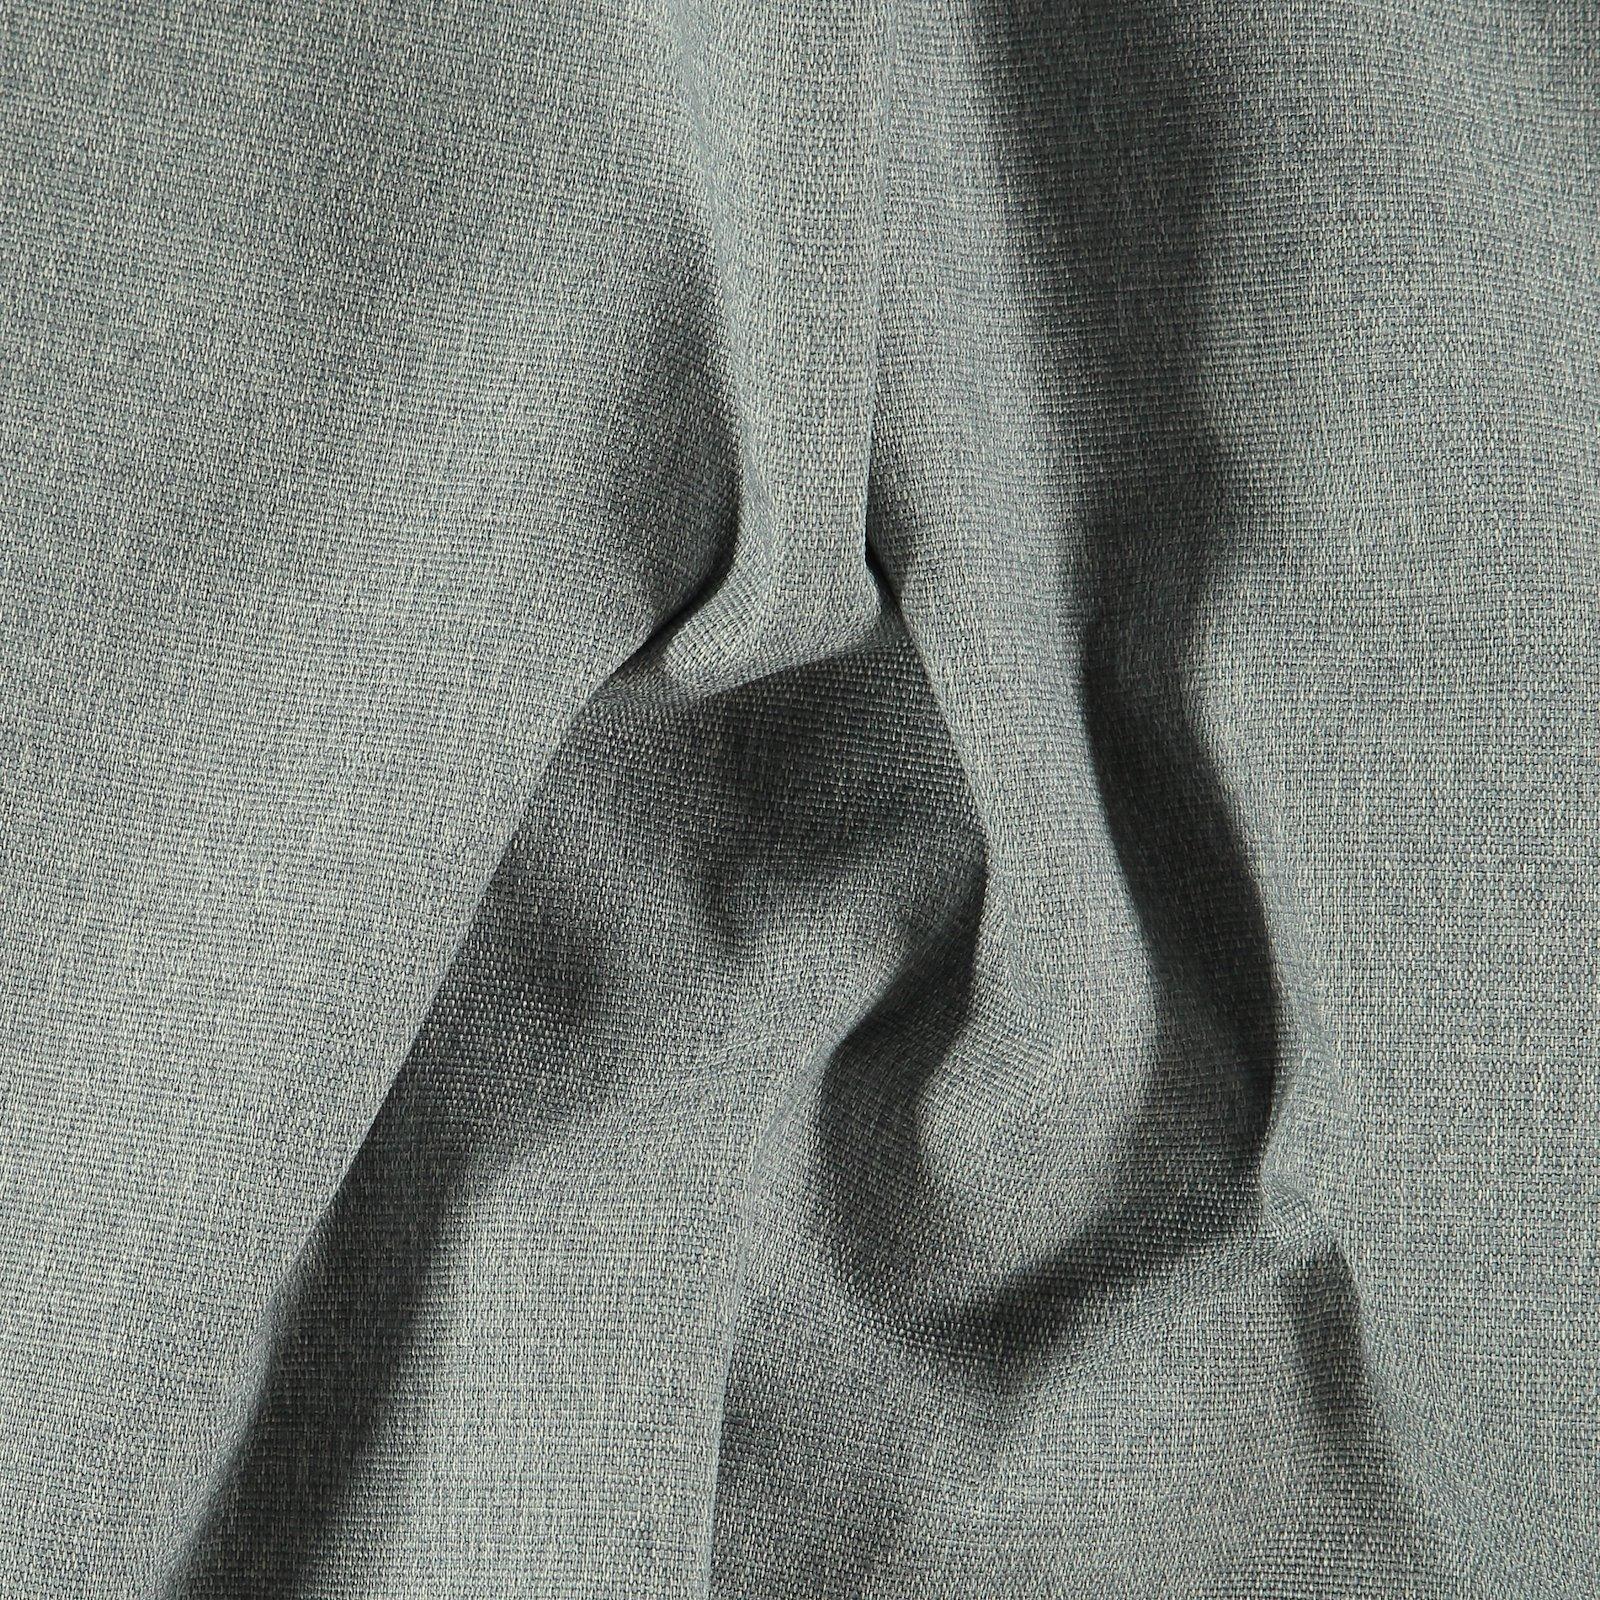 Upholstery fabric grey w/white backing